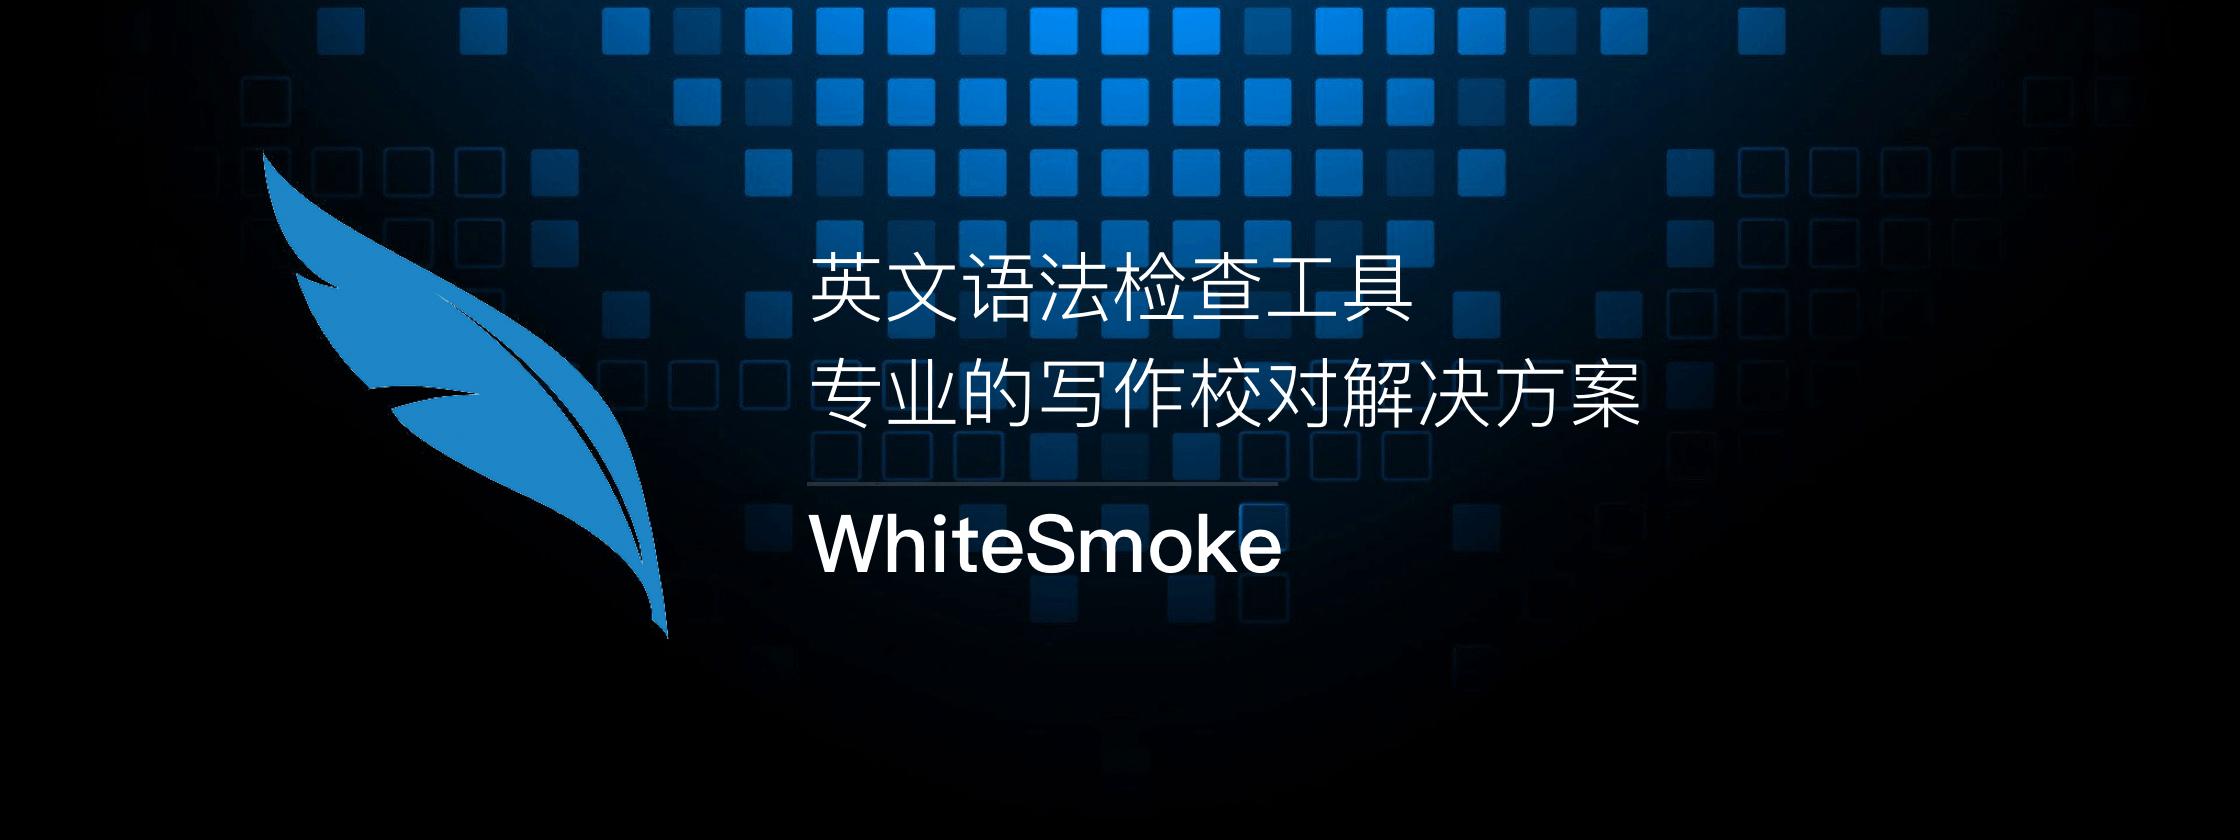 WhiteSmoke,全面的英文写作语法检查工具